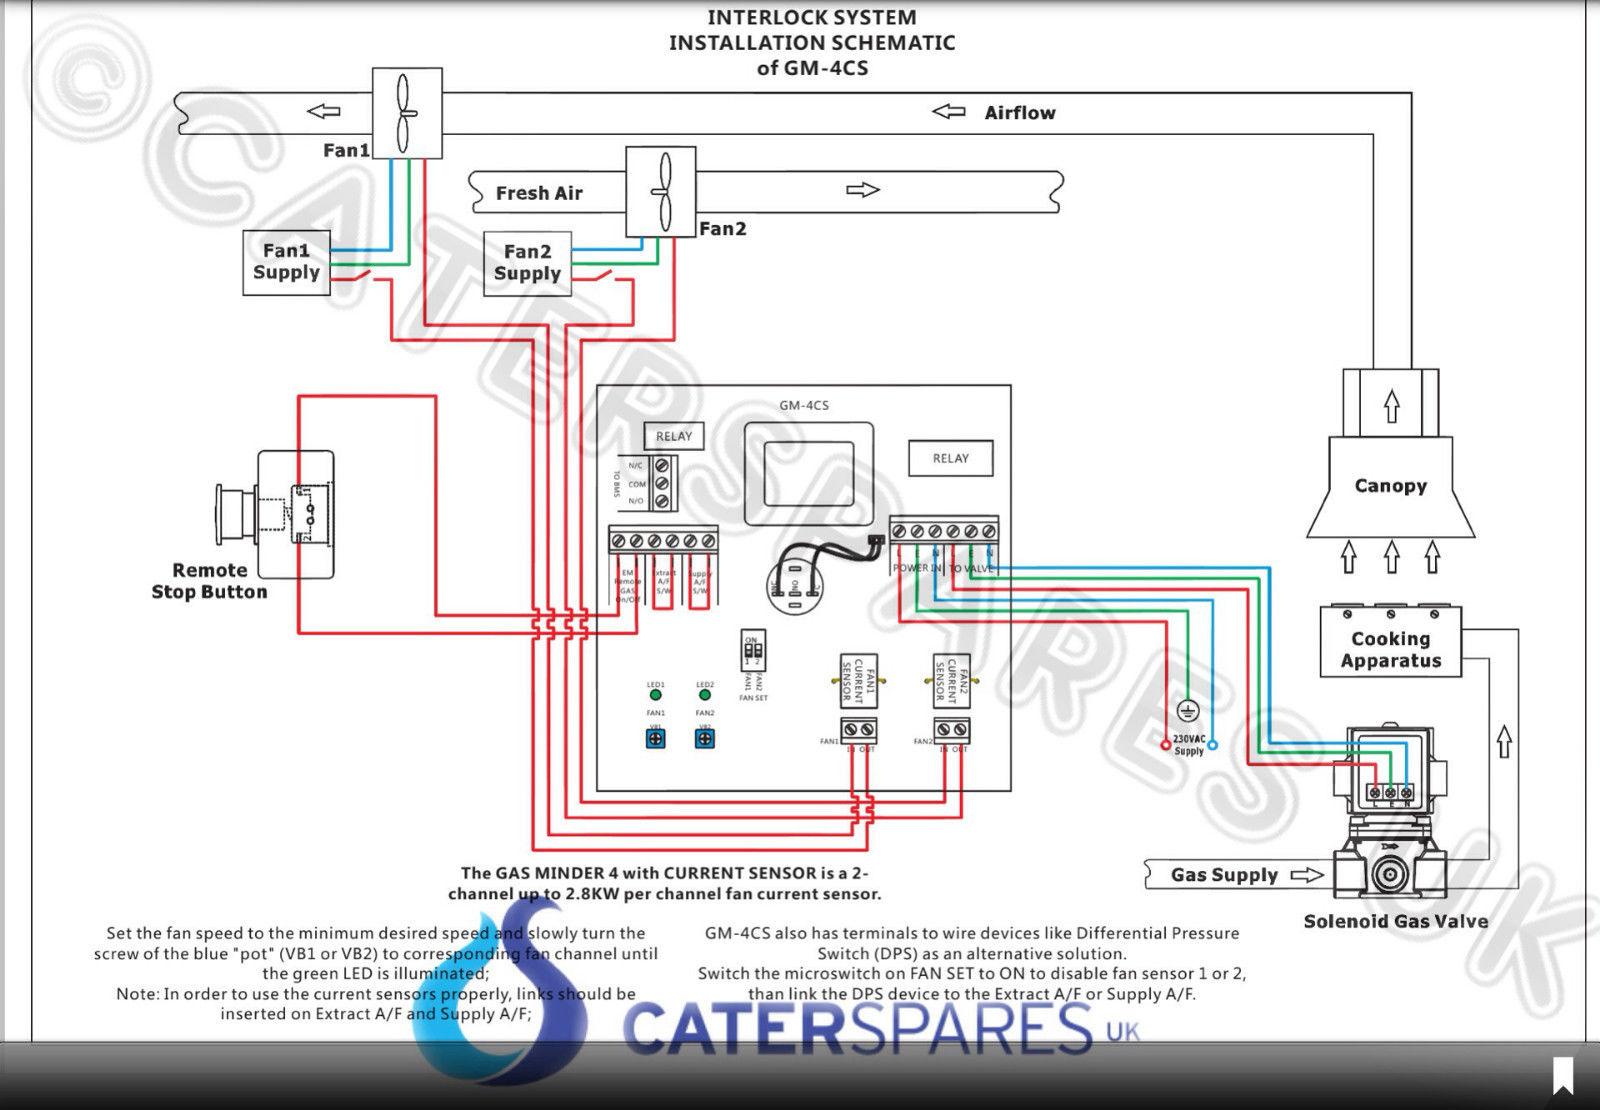 robertshaw oven thermostat wiring diagram cub cadet lt1045 parts current sensor commercial gas interlock kit & 1